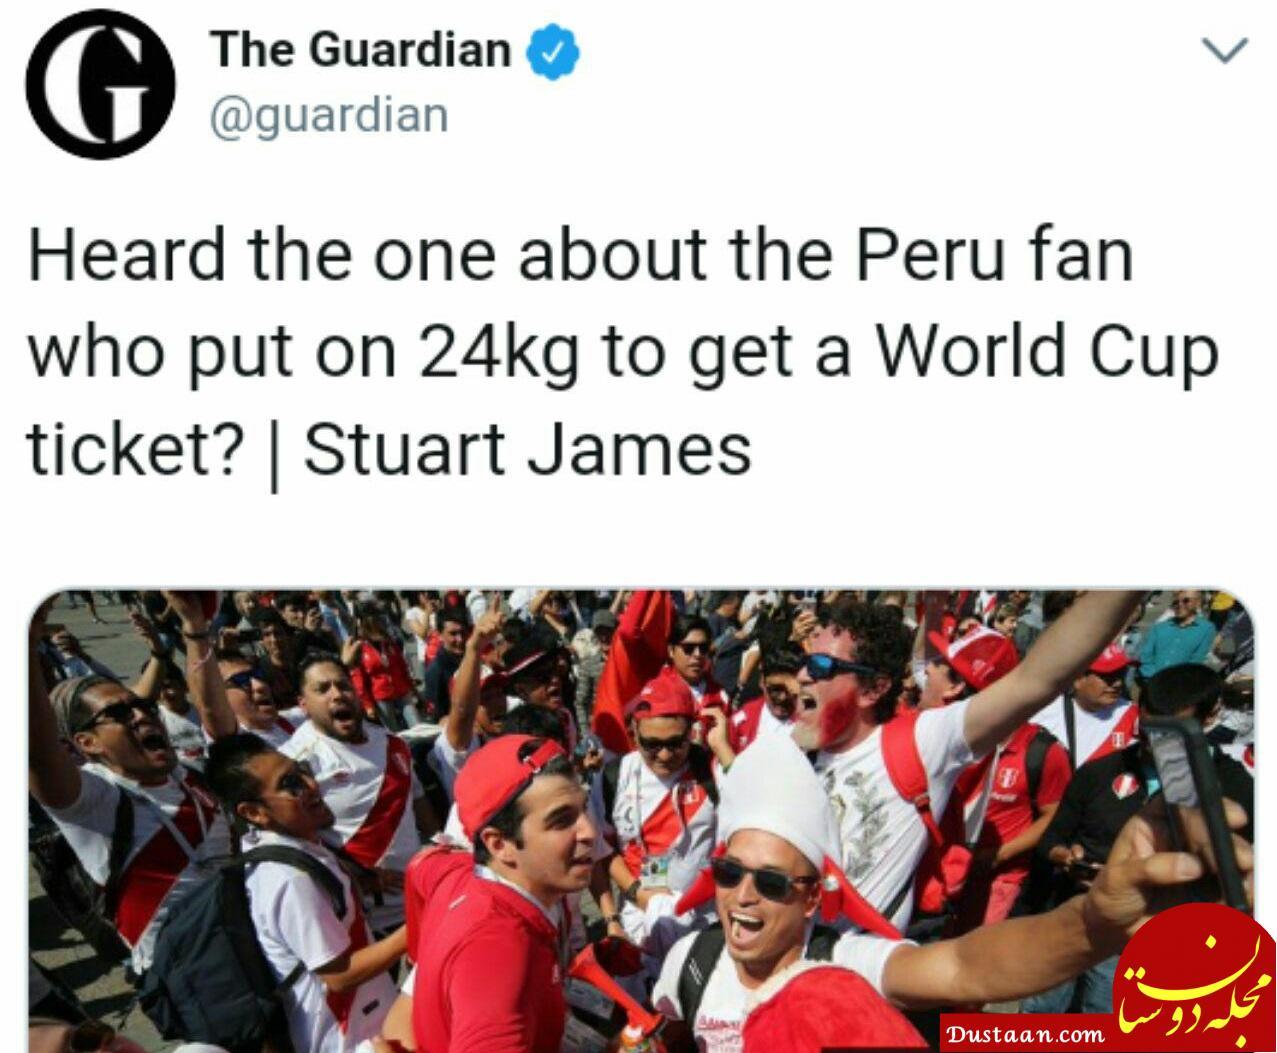 www.dustaan.com 24 کیلو اضافه وزن برای تماشای بازی های جام جهانی! +عکس